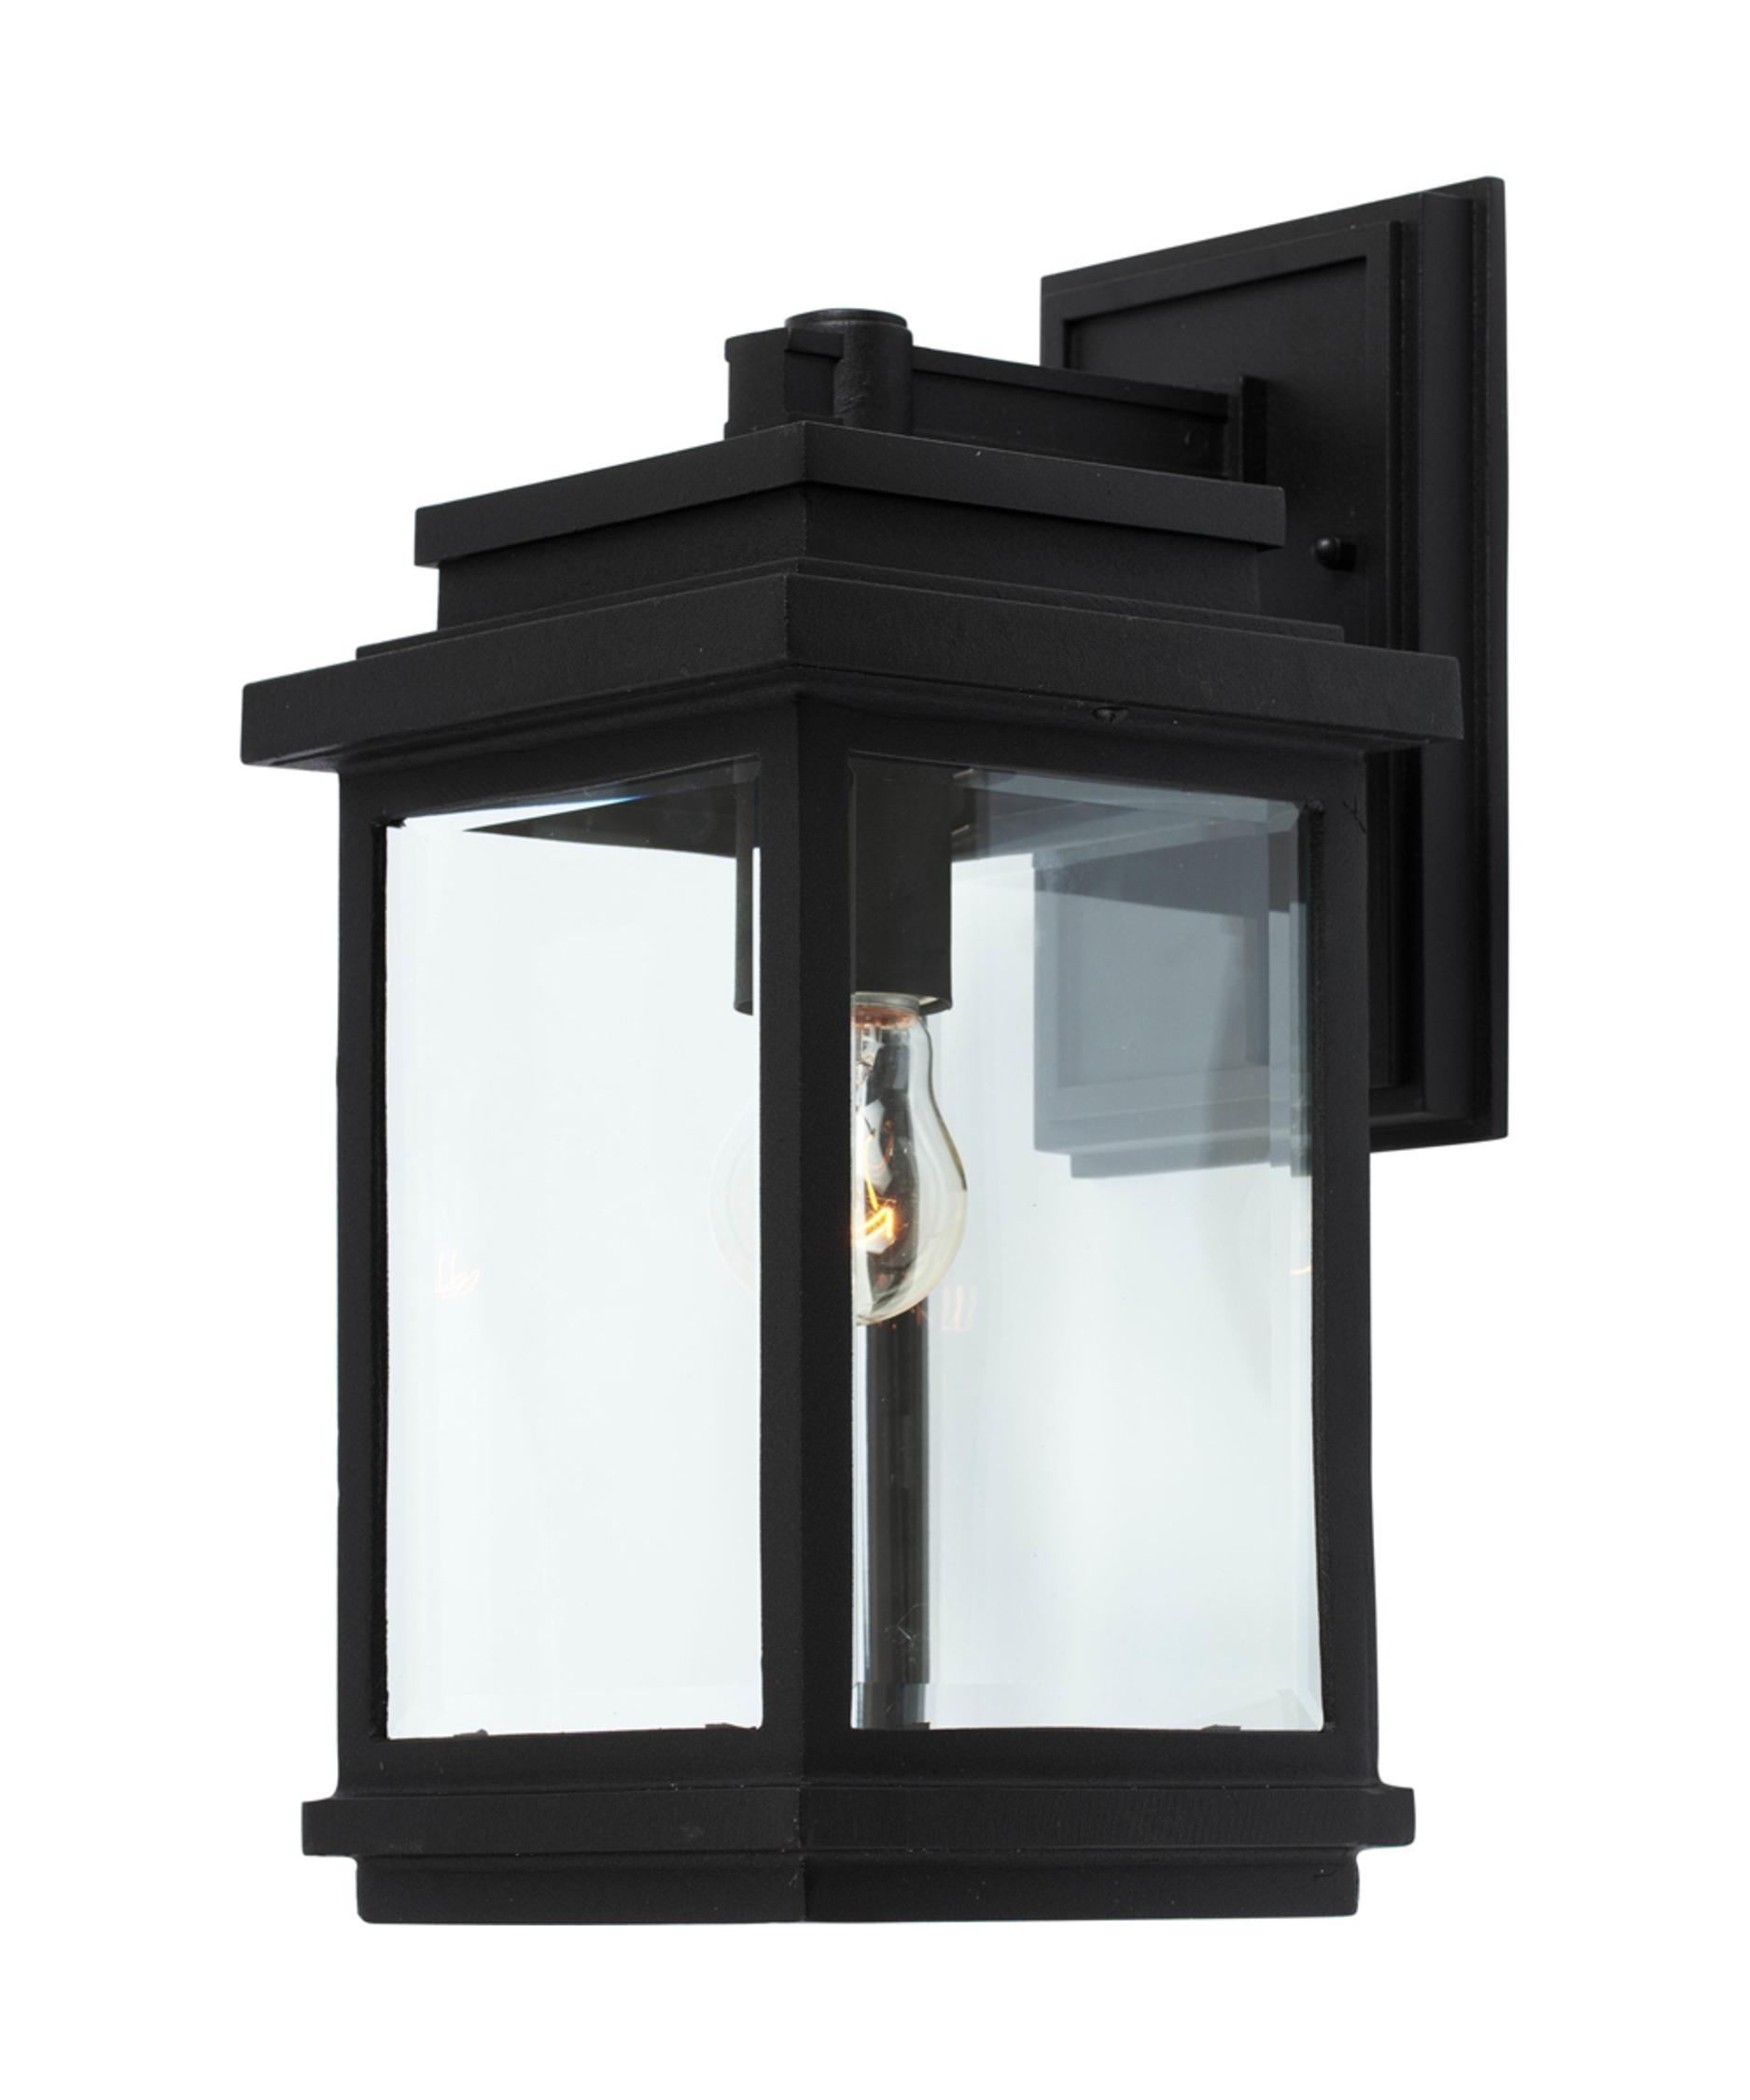 Artcraft Ac8290 Fremont 7 Inch Wide 1 Light Outdoor Wall Light Intended For Outdoor Wall Light Glass (#1 of 15)